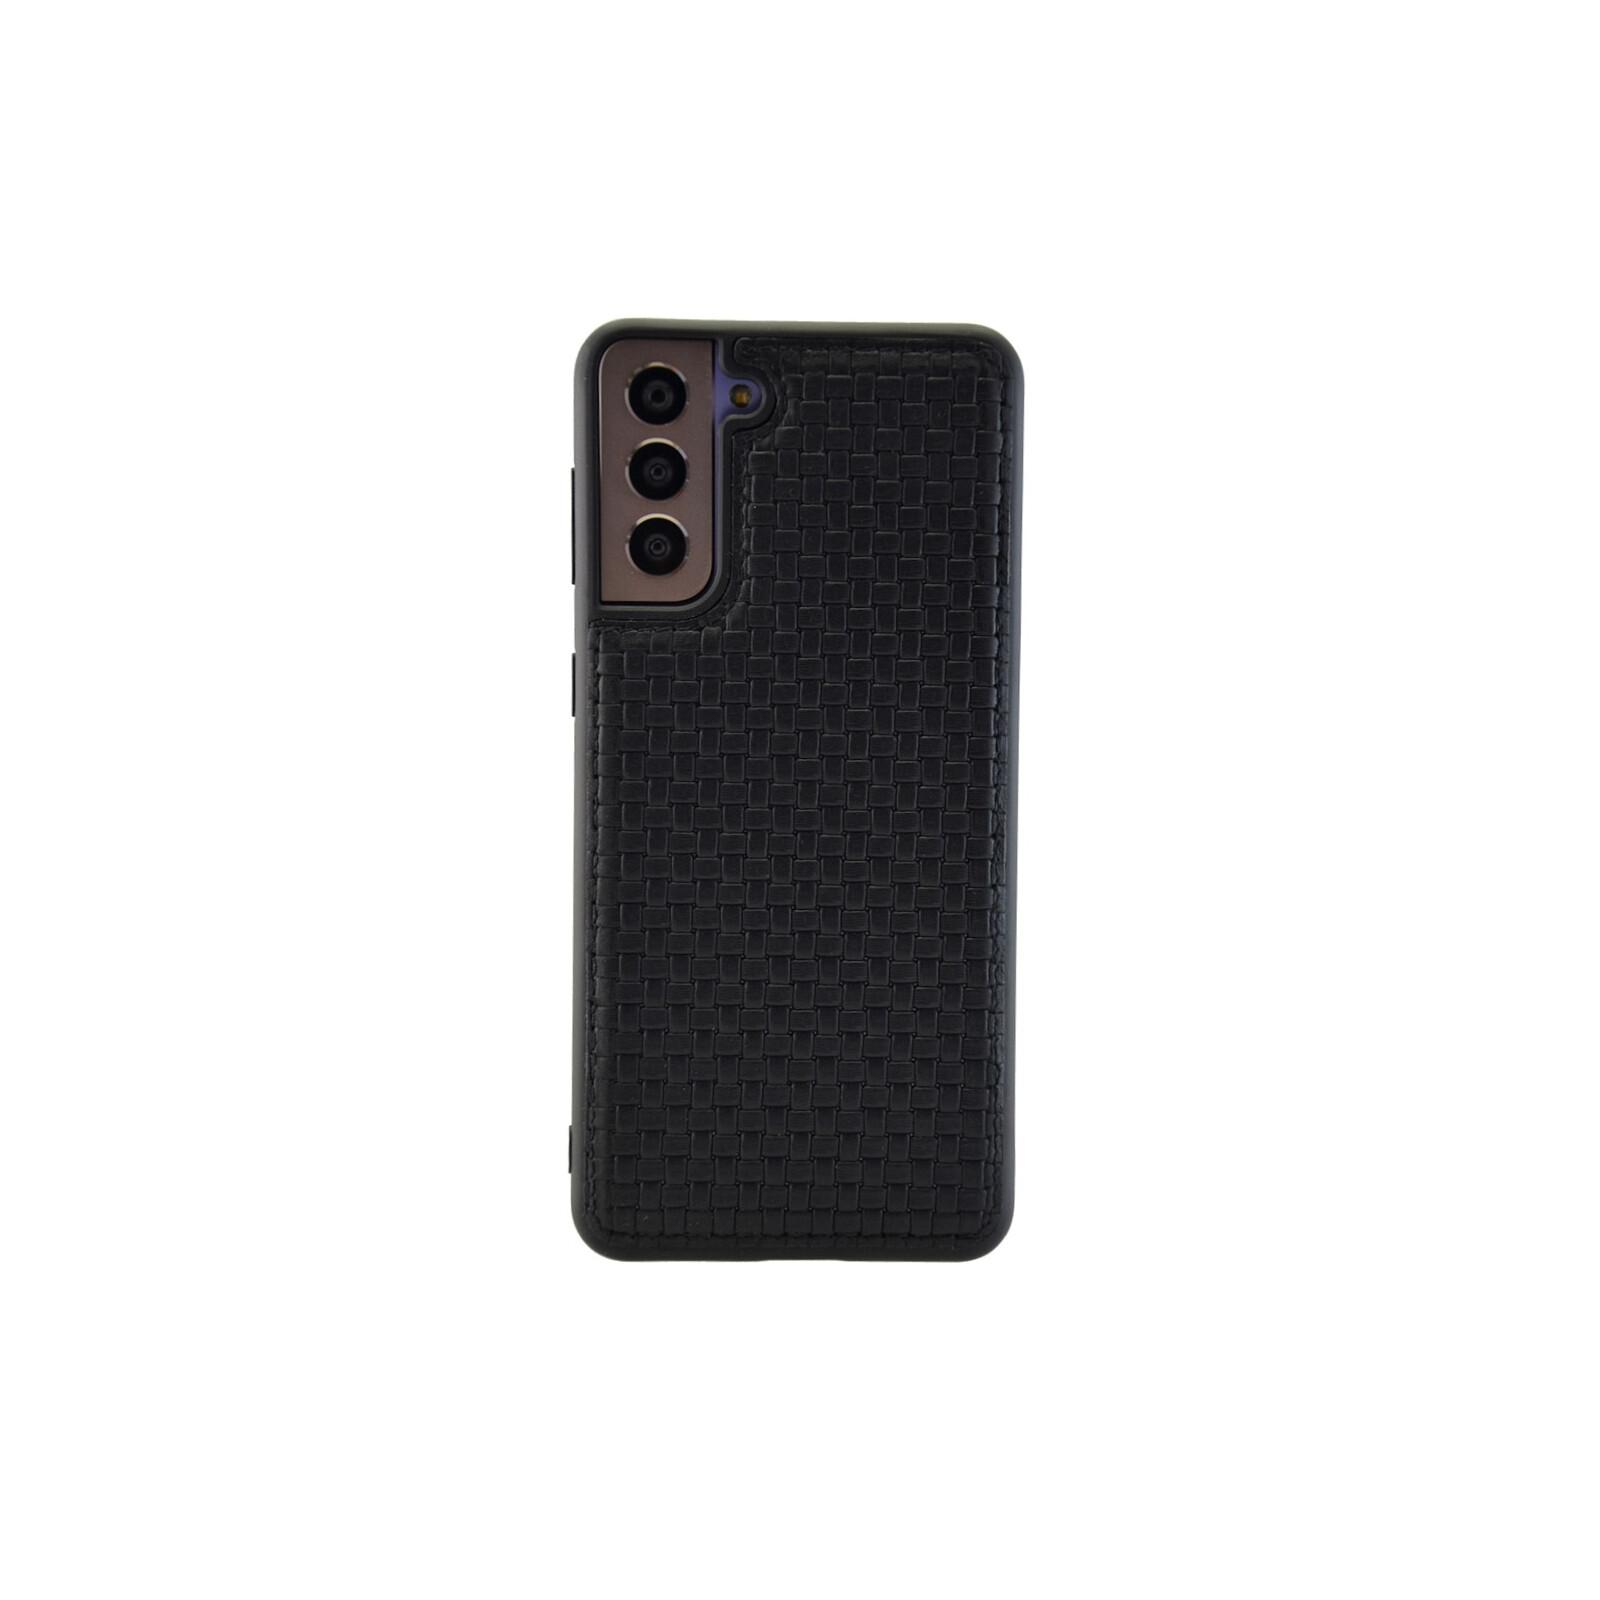 Galeli Back VITO Samsung Galaxy S21 classy black